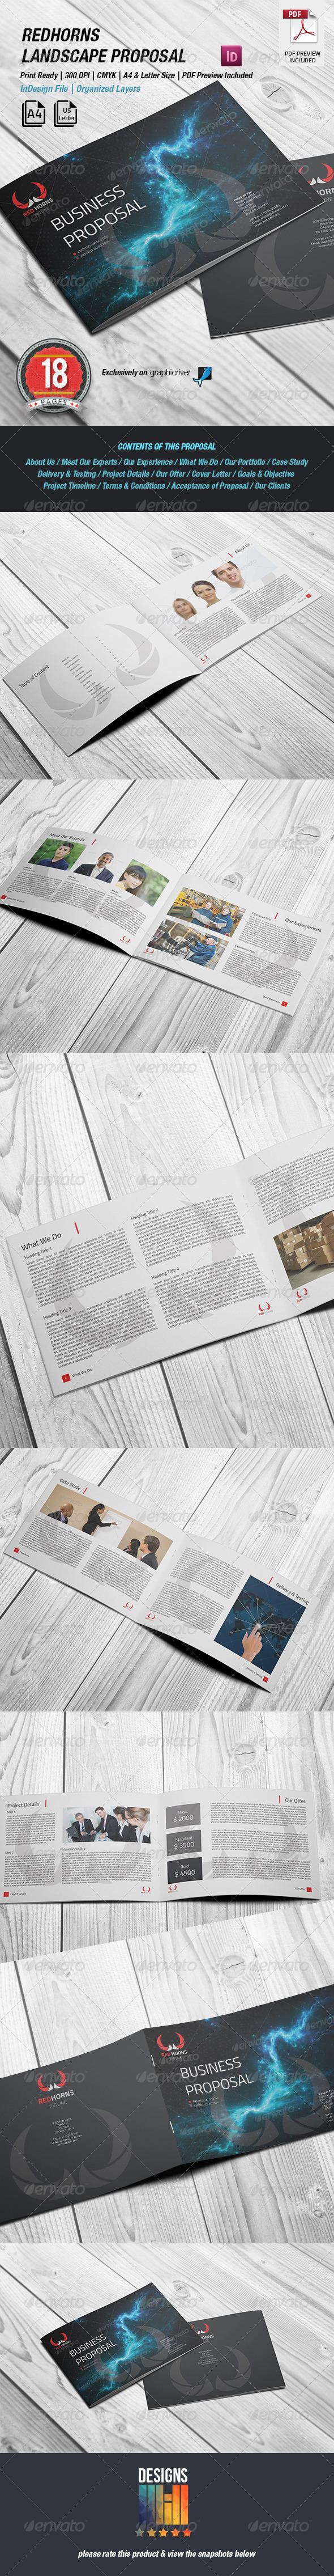 RedHorns Landscape Proposal  - Proposals & Invoices Stationery